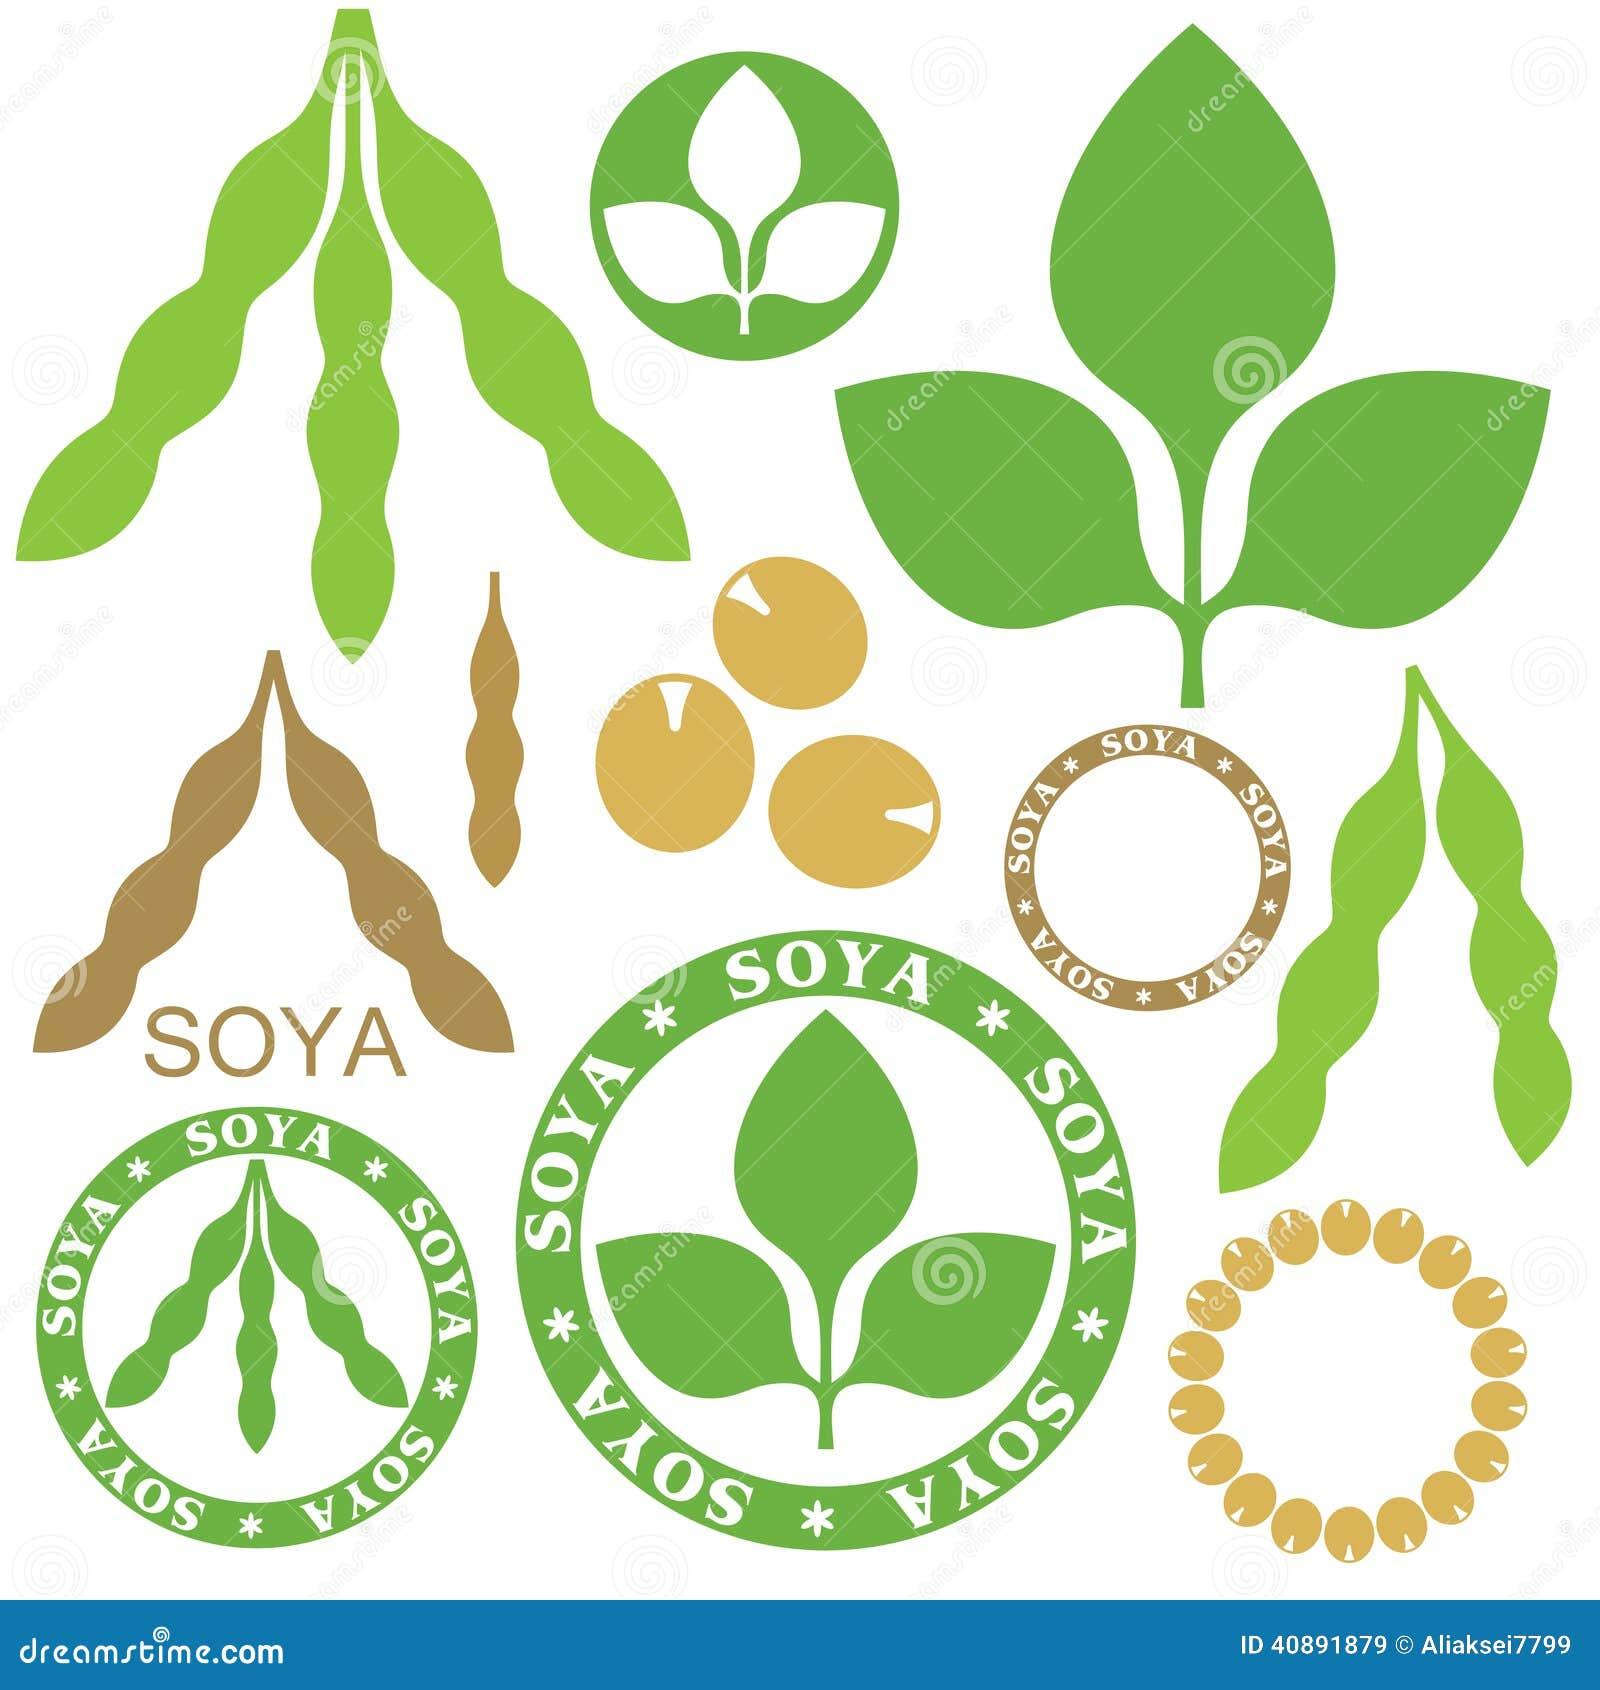 soybean stock illustrations 1 061 soybean stock illustrations rh dreamstime com Soybean Pods Soybean Plant Clip Art